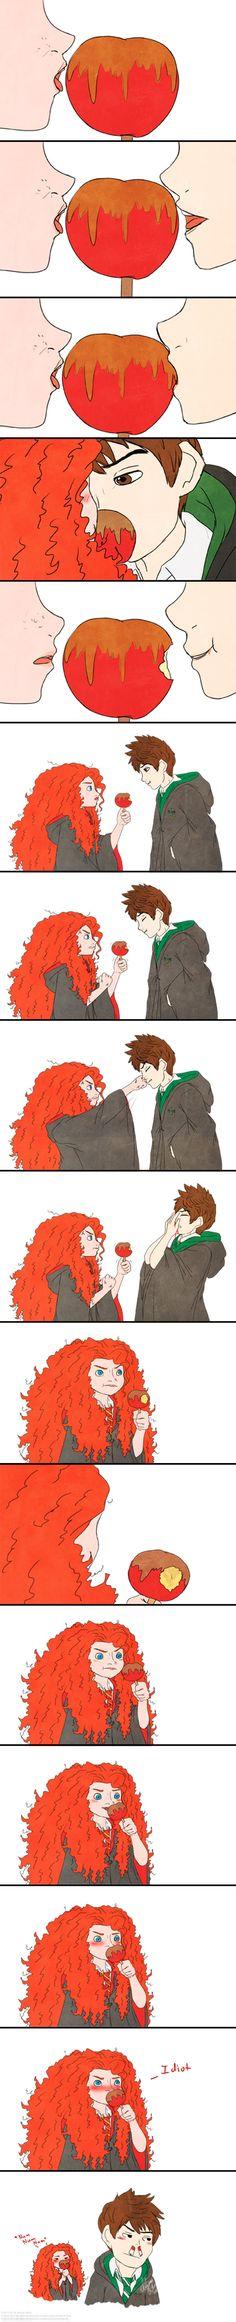 Jarida:Hogwarts AU Apples by Kiome-Yasha on DeviantArt